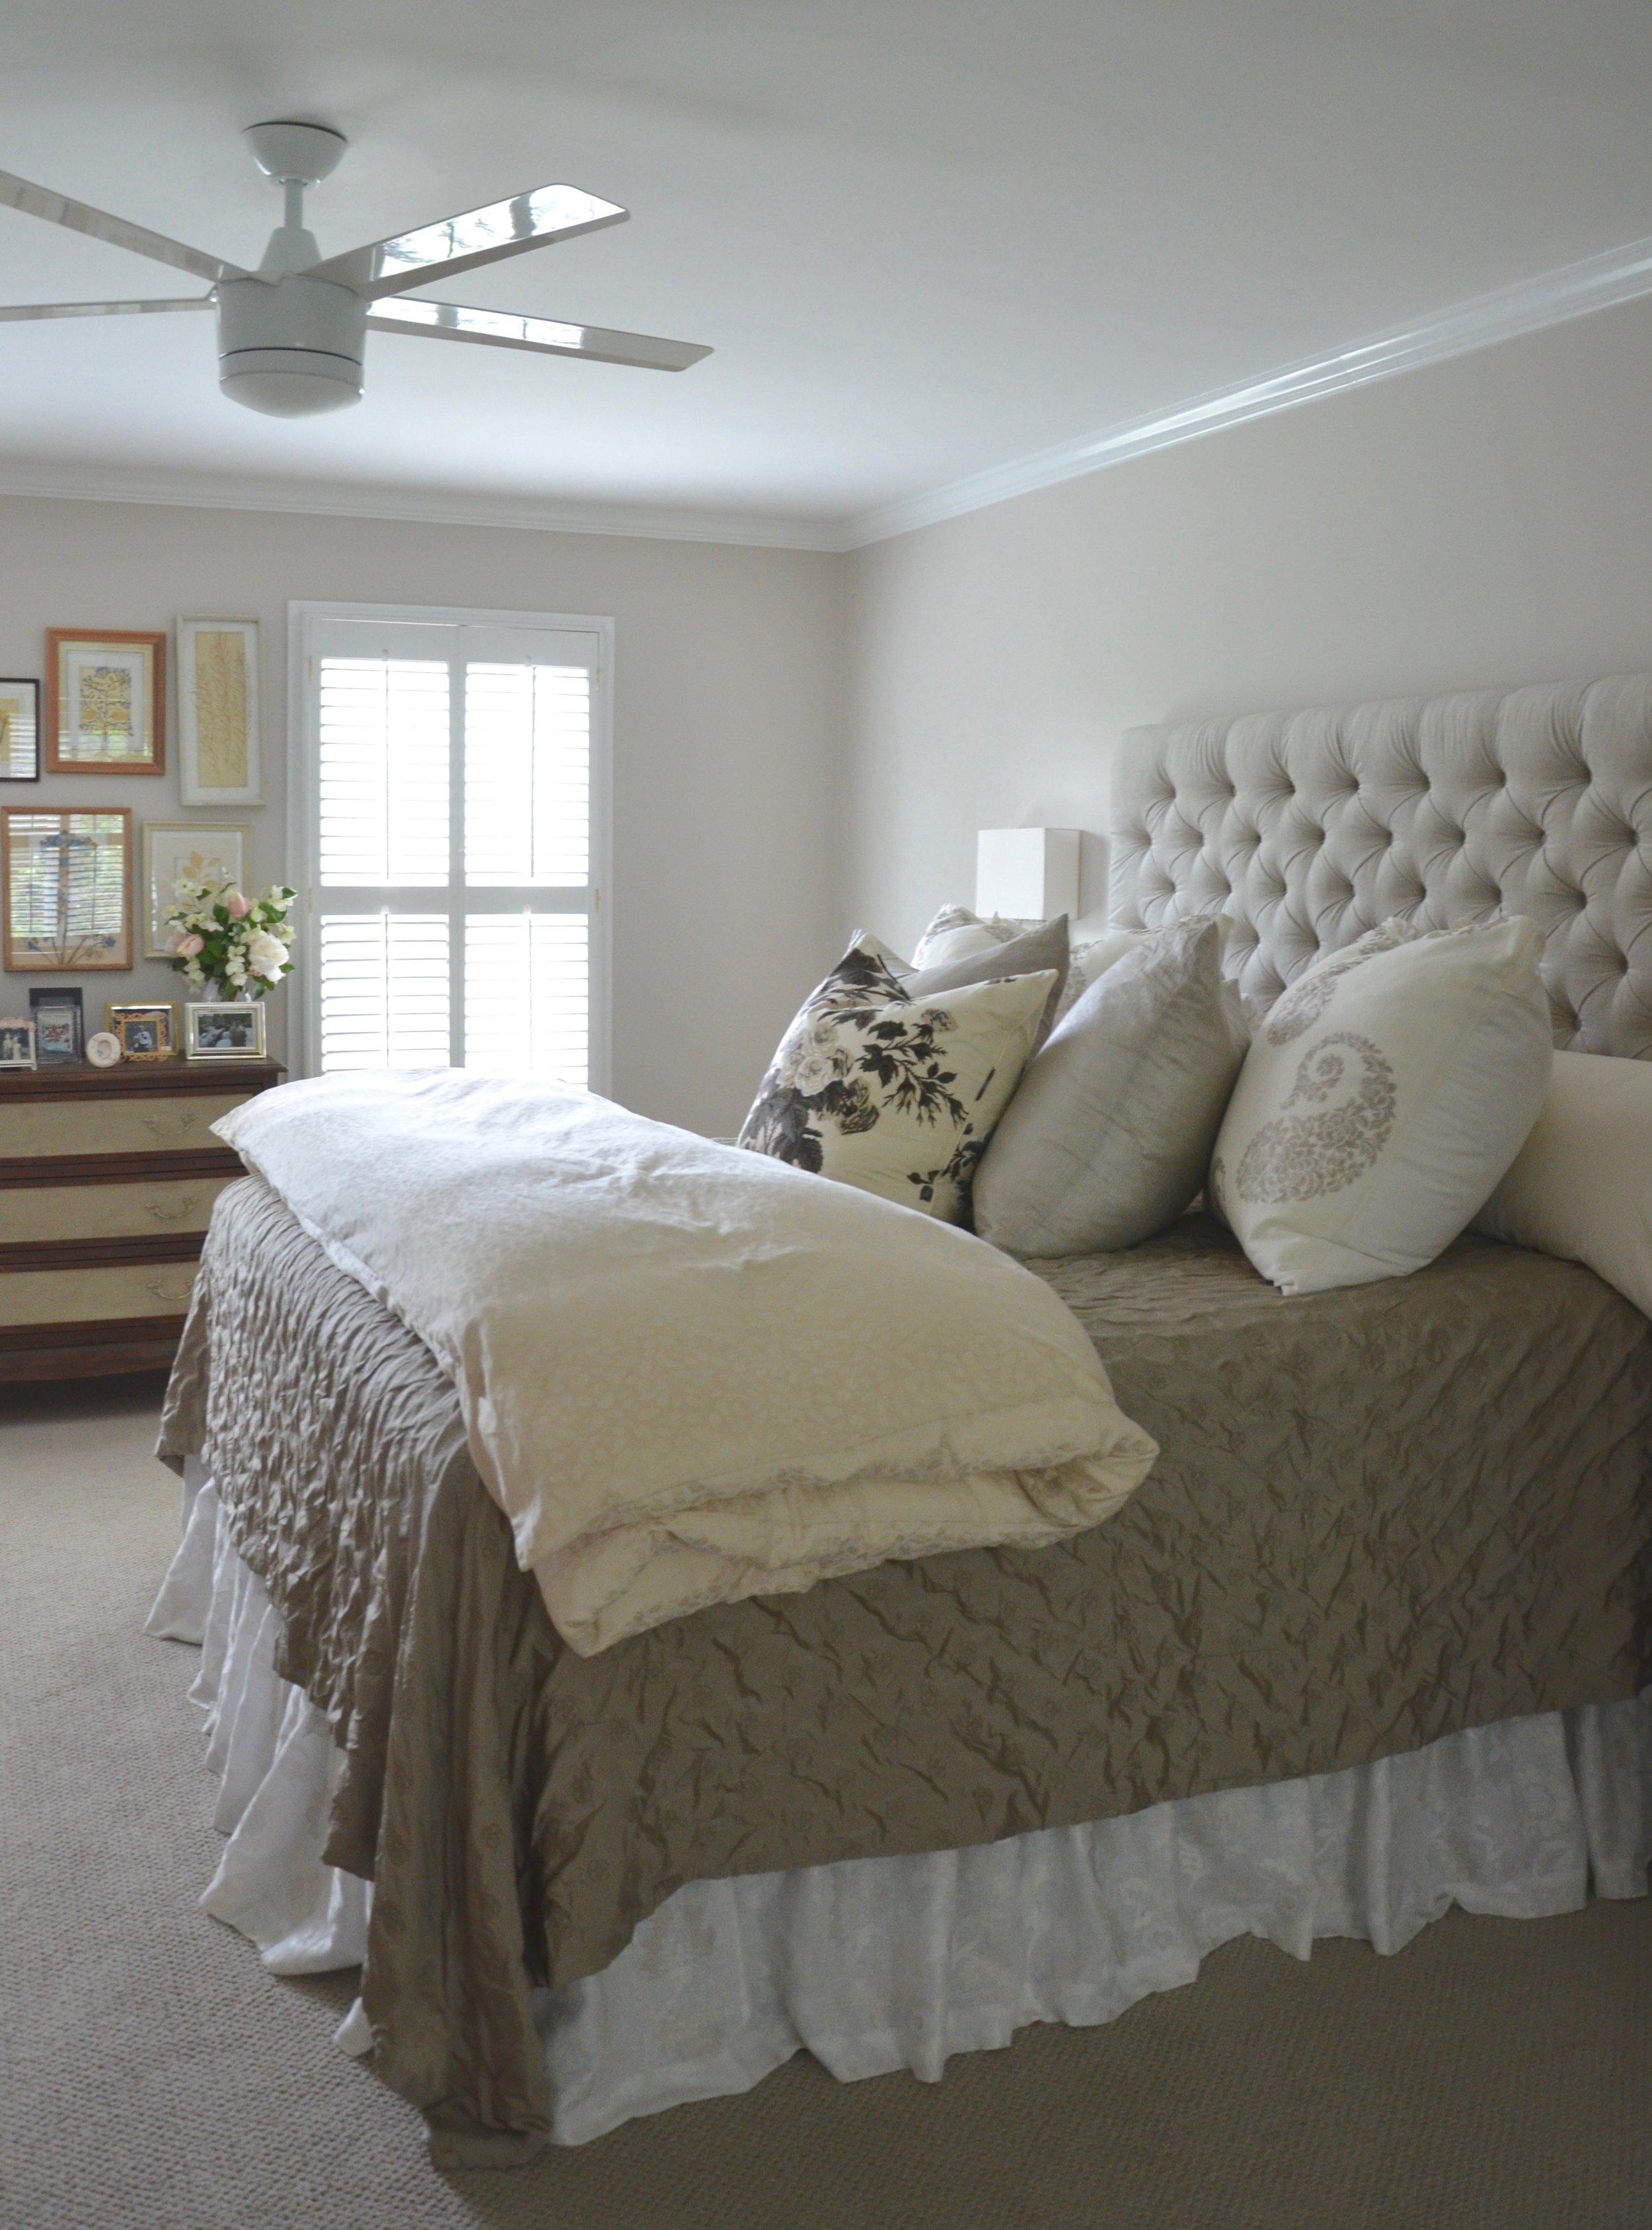 Valerianne of DC residential interior design